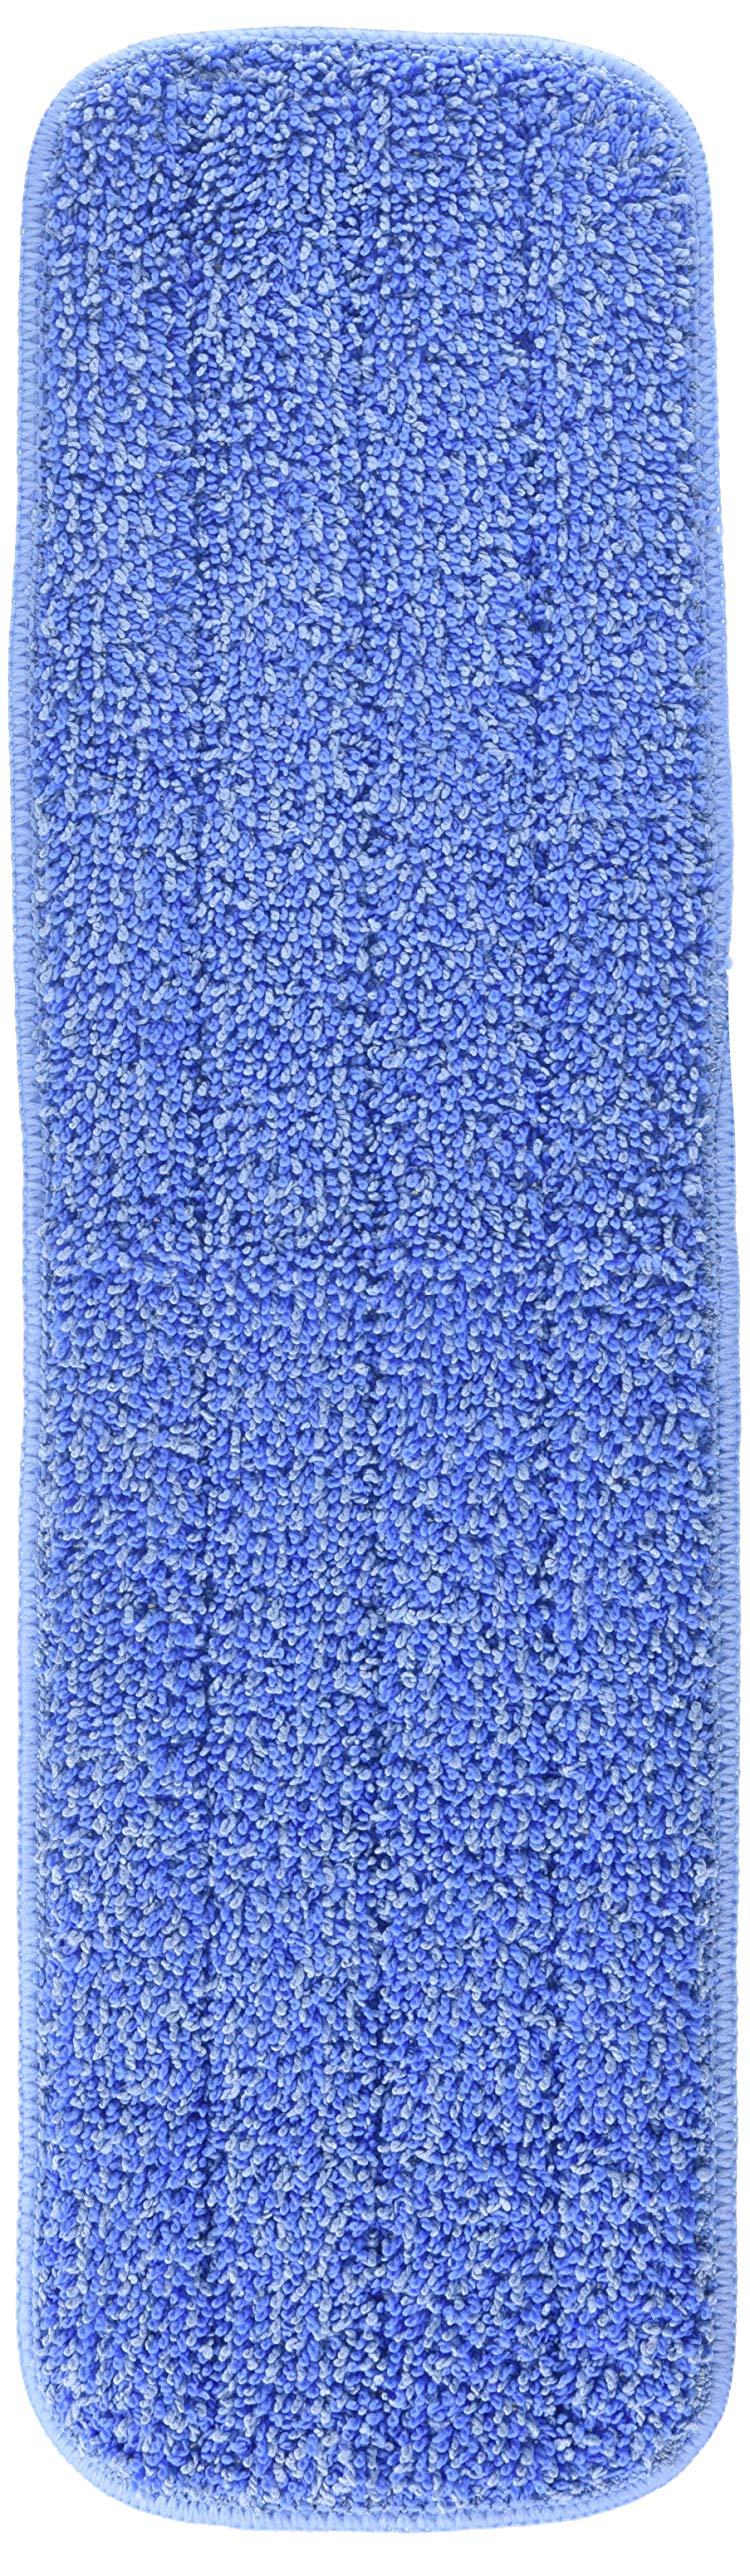 Turkey Creek Essentials Microfiber Mop Pads